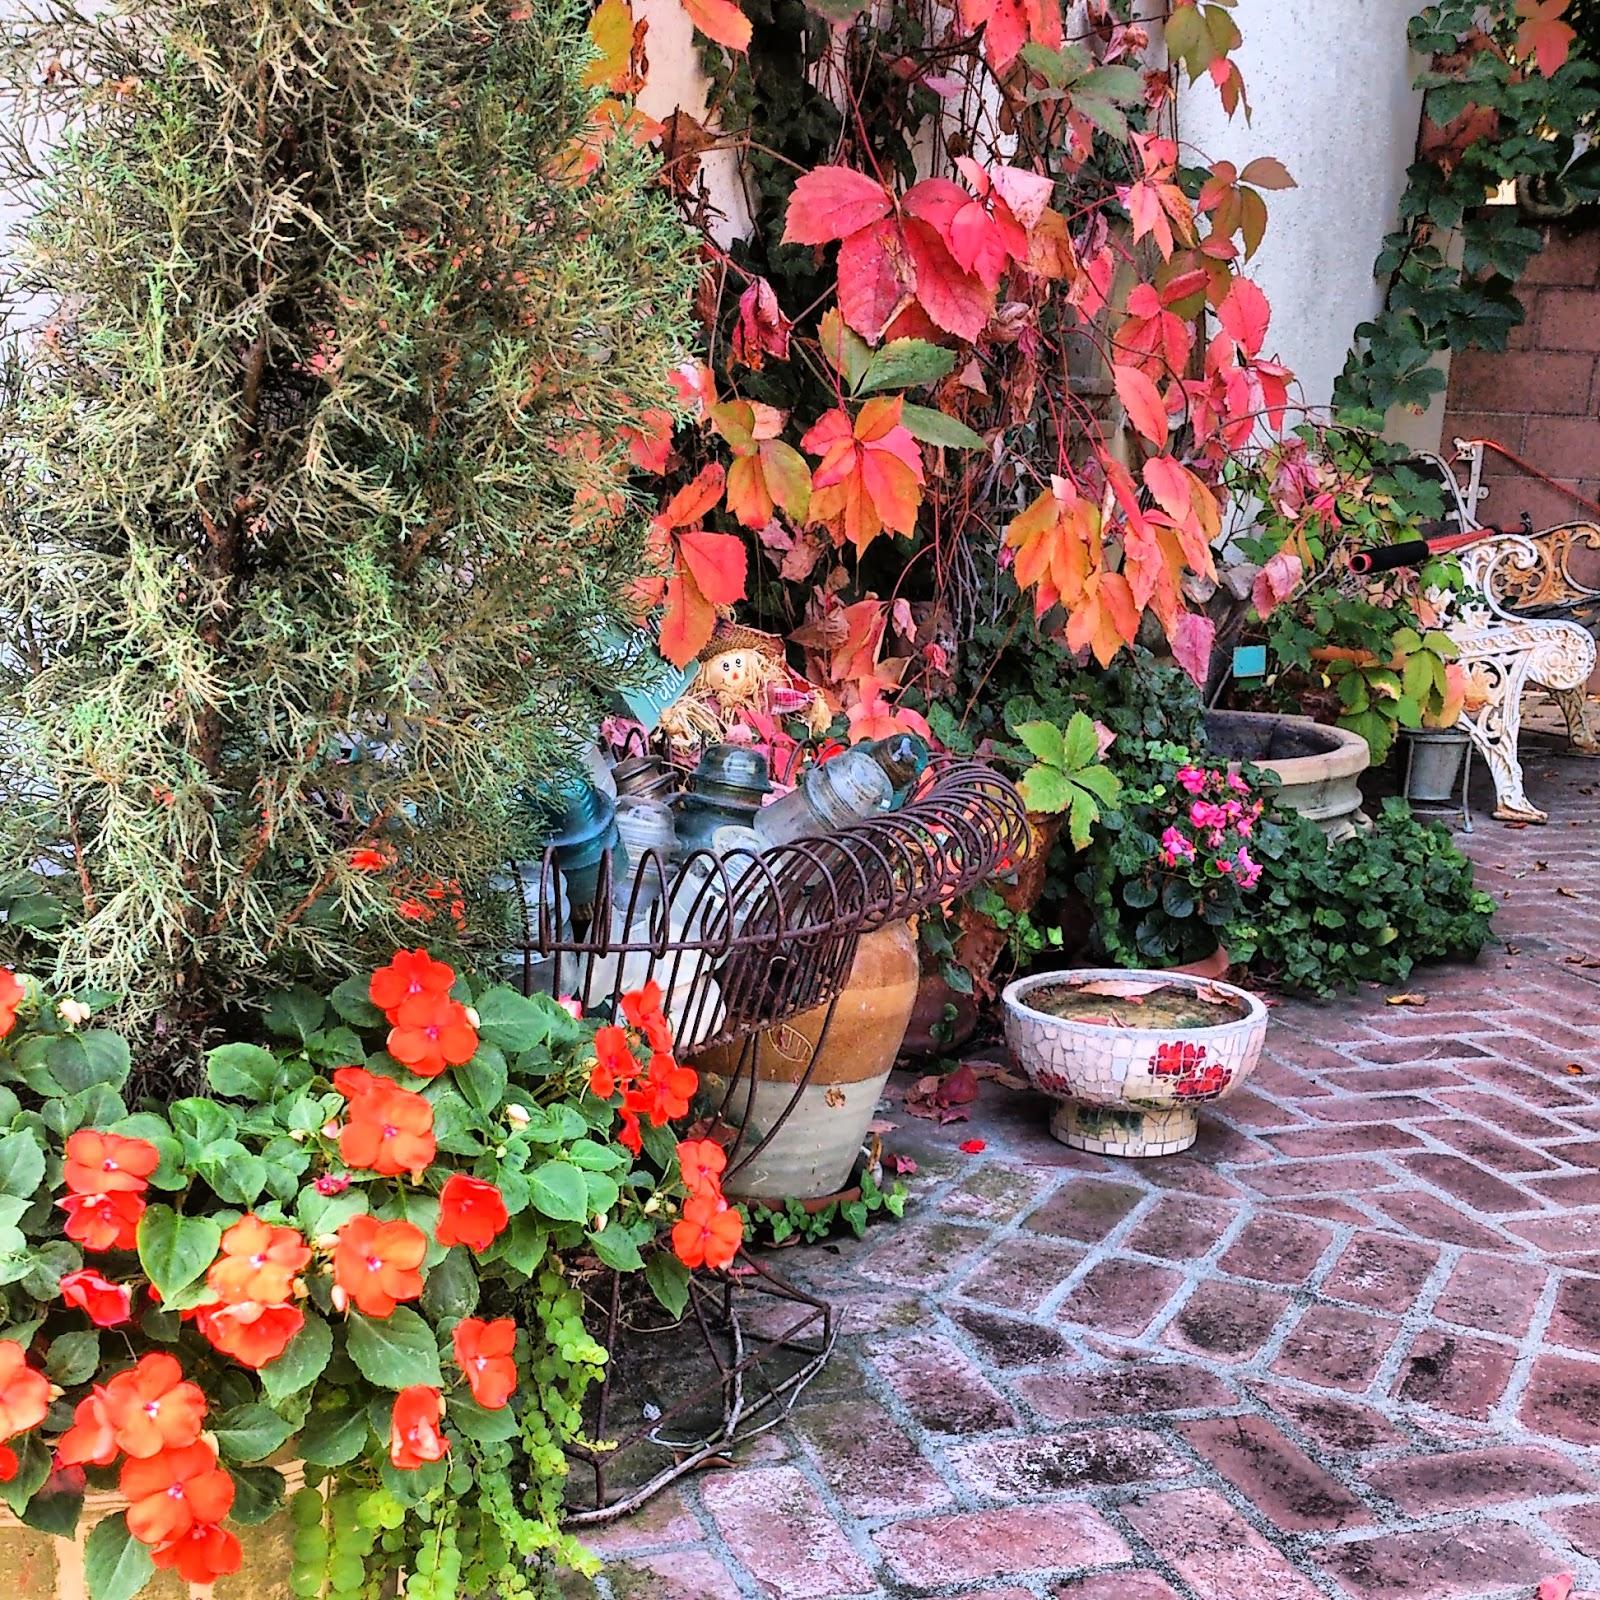 Sunny Simple Life Pumpkins Halloween Decor and the Garden